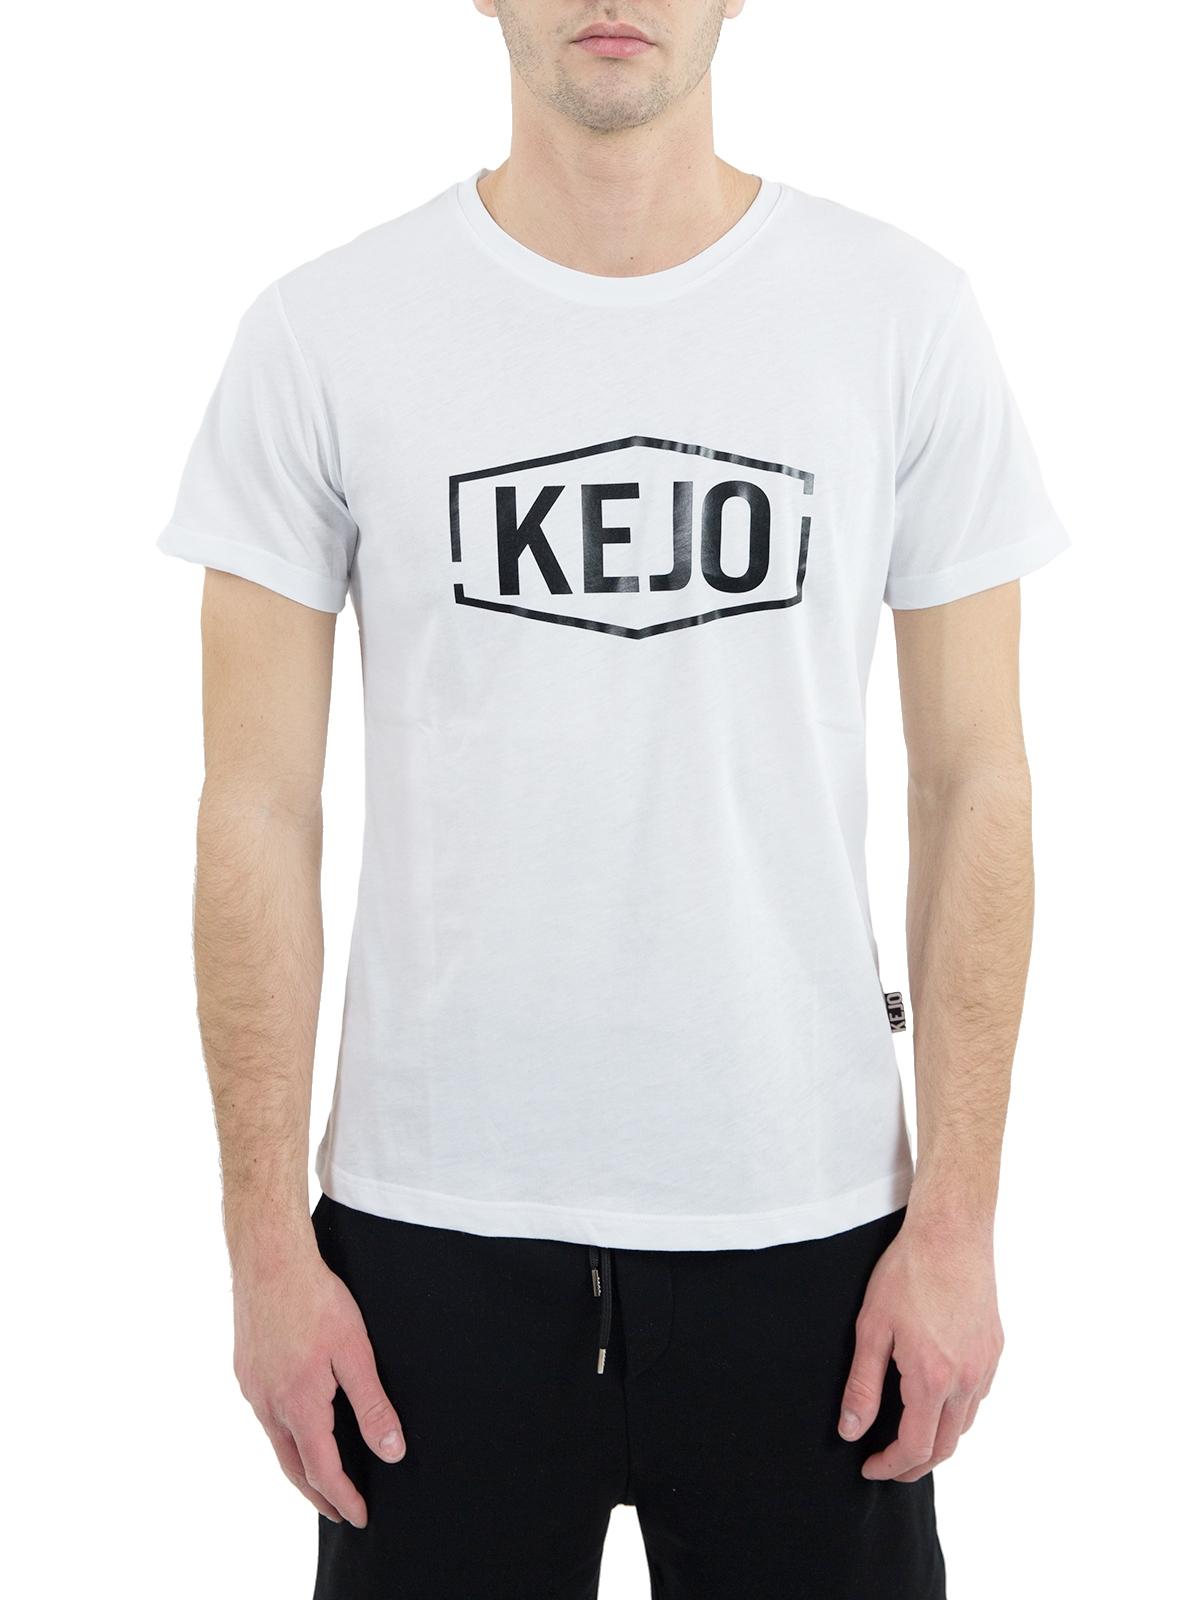 Kejo T-Shirt KS19 110M